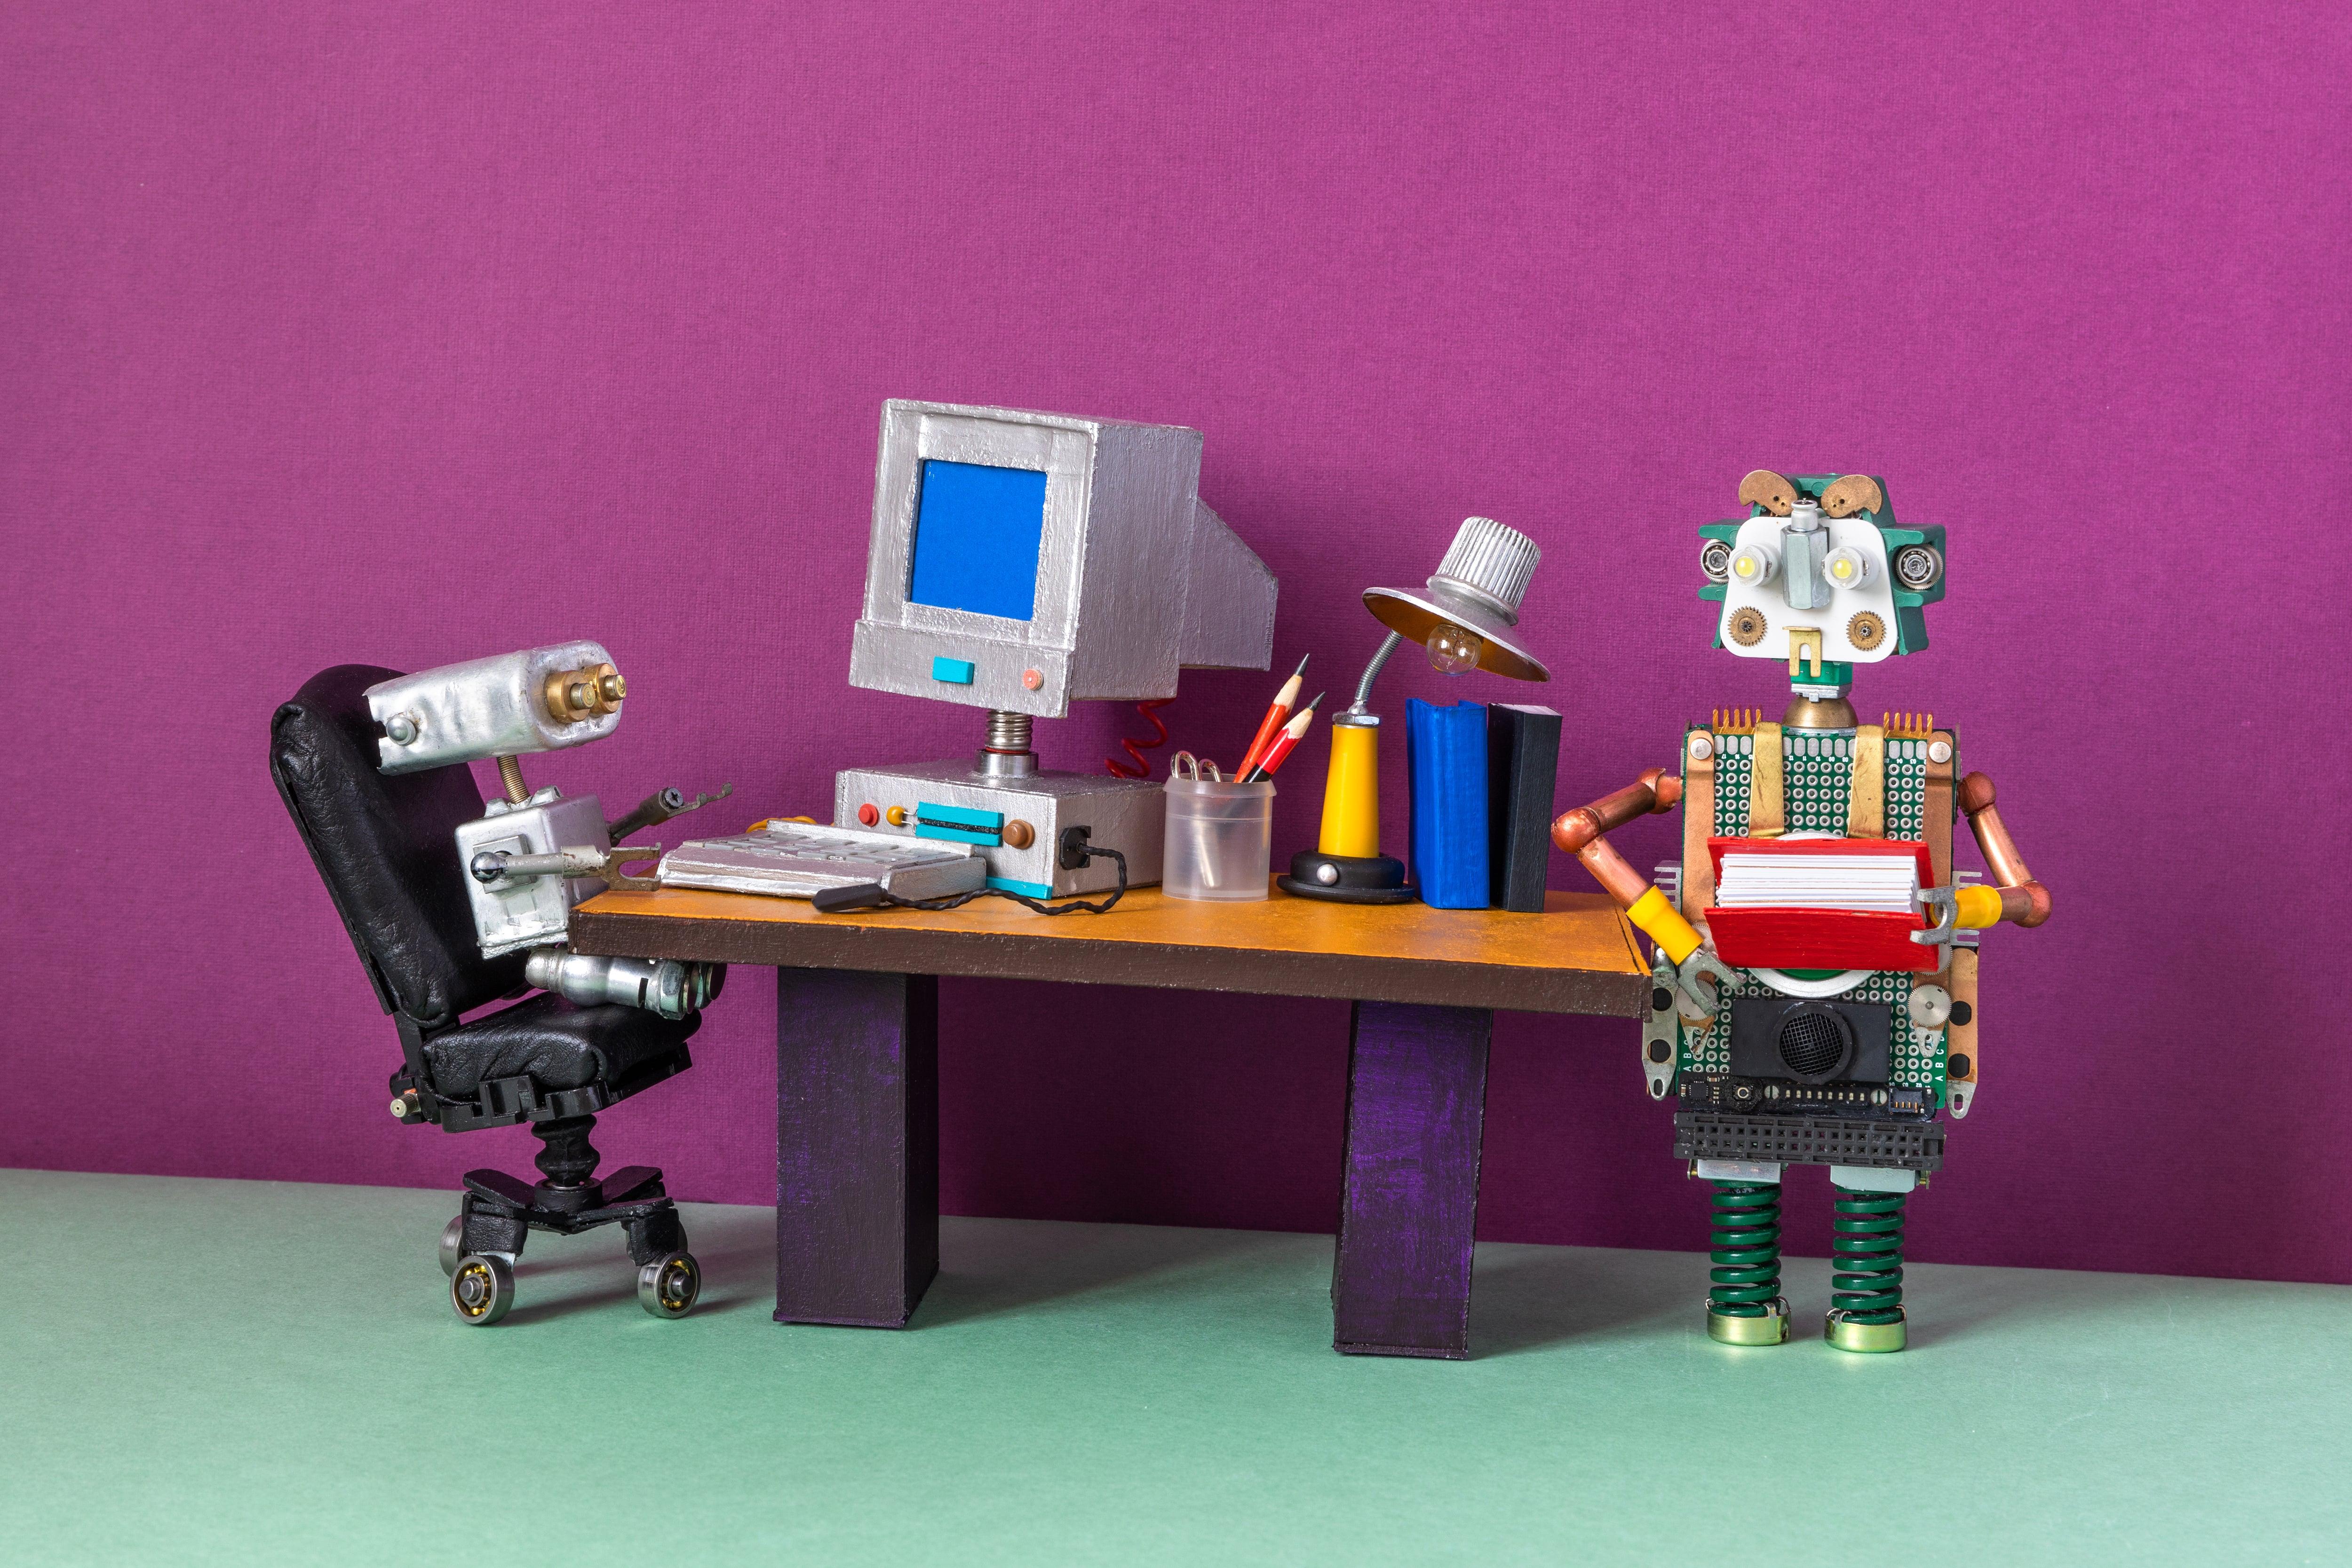 Crawler Robô para coleta de dados